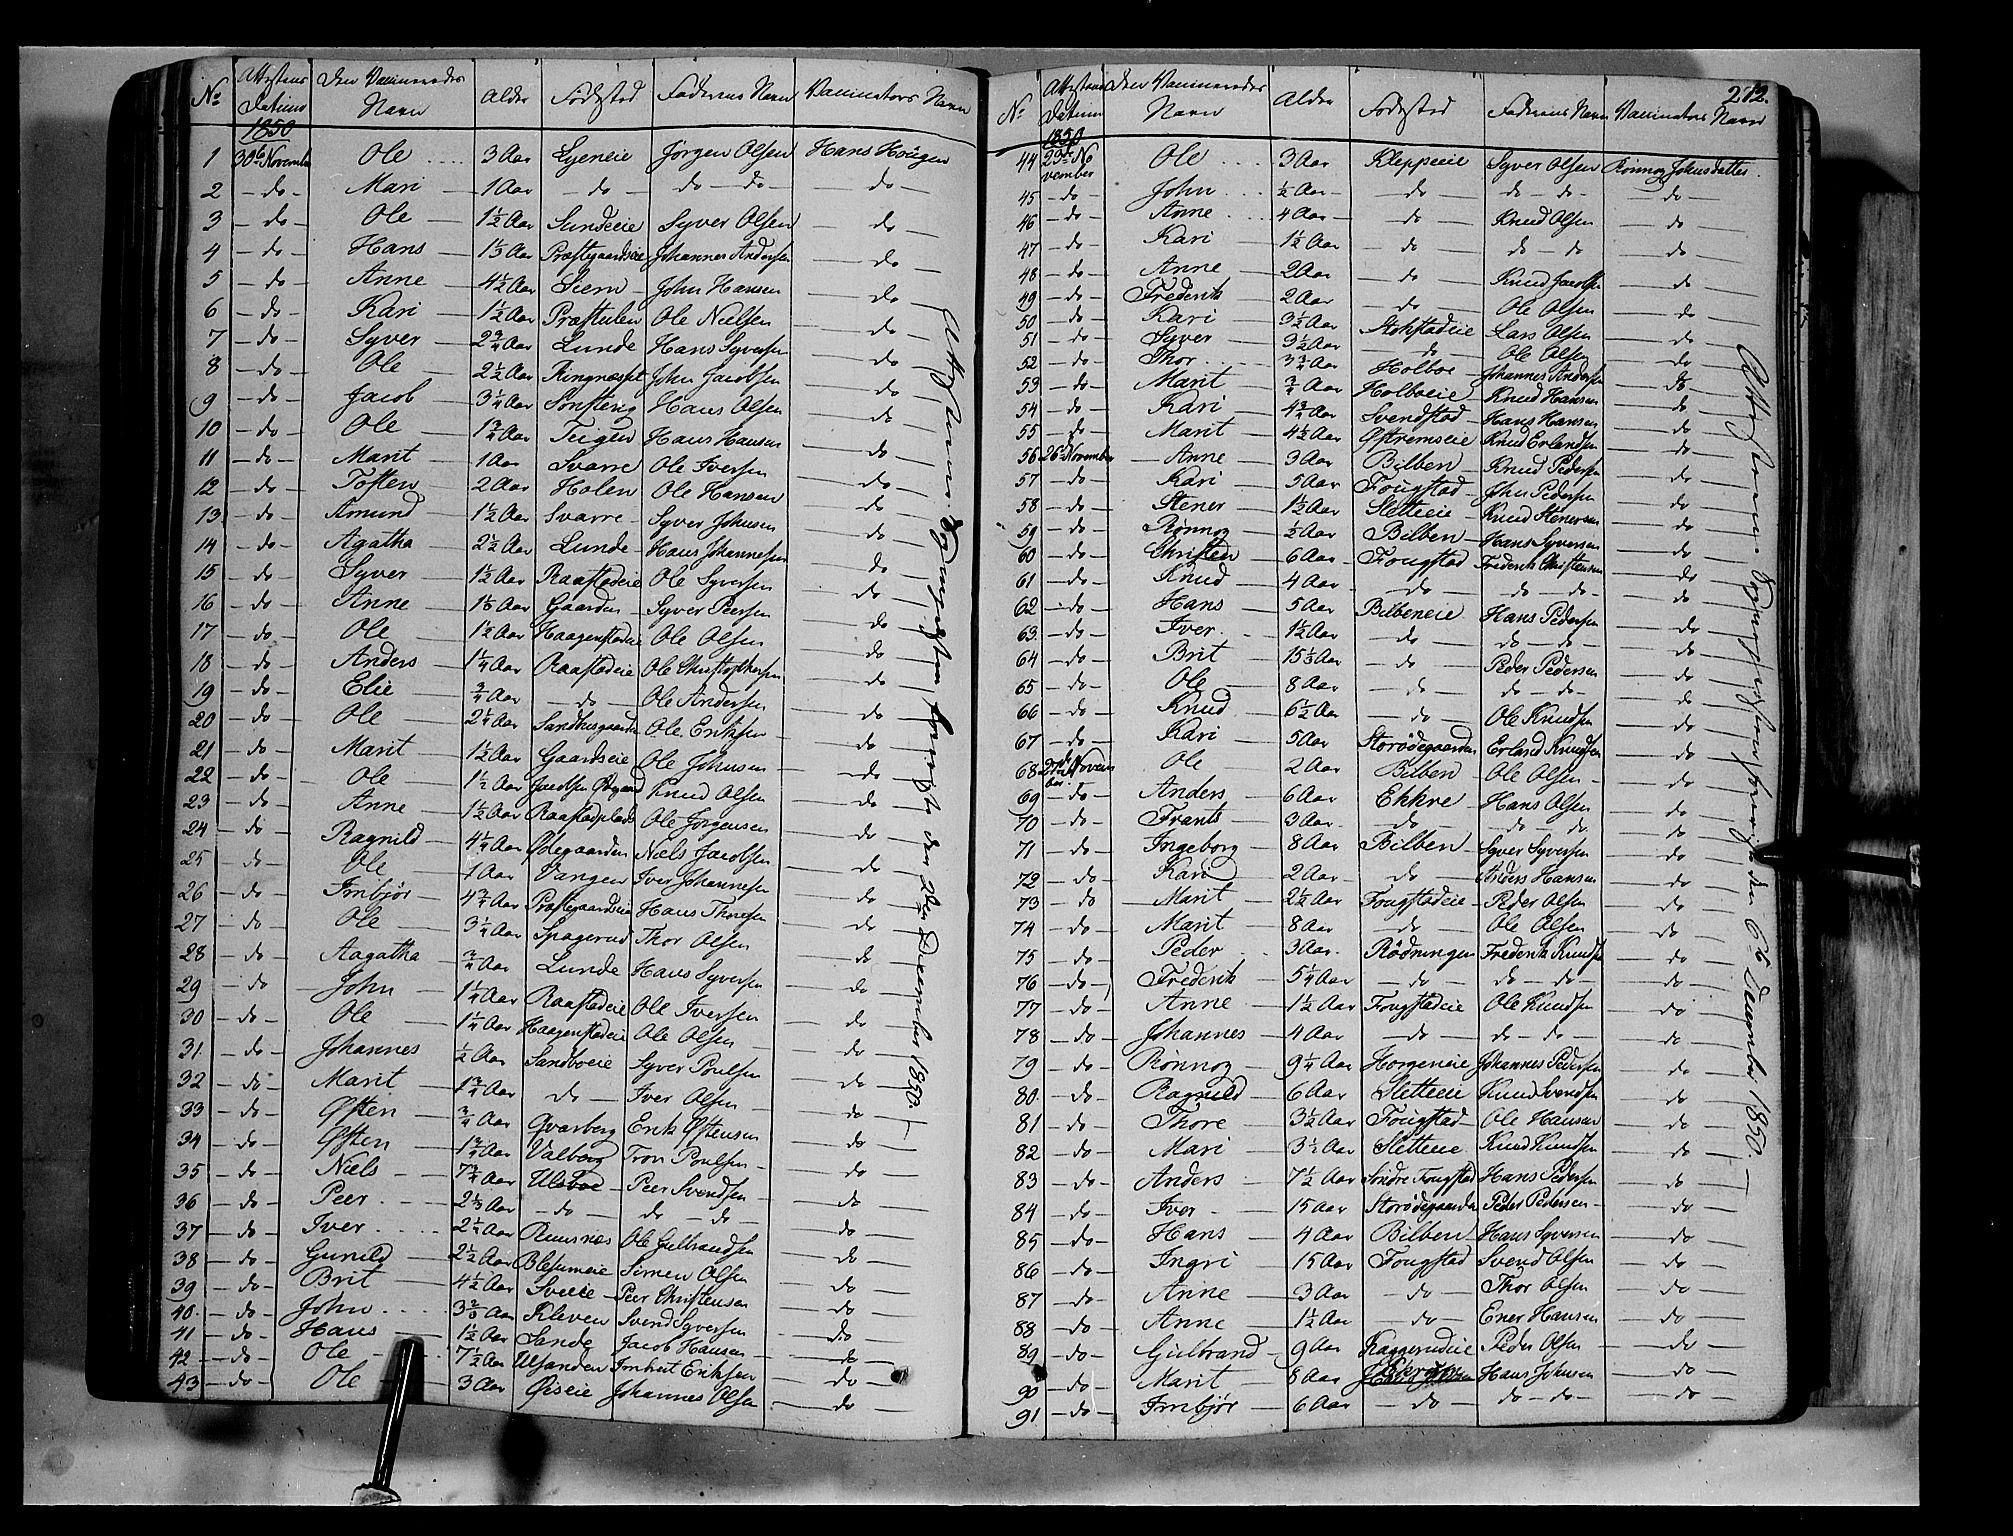 SAH, Vågå prestekontor, Ministerialbok nr. 5 /1, 1842-1856, s. 272